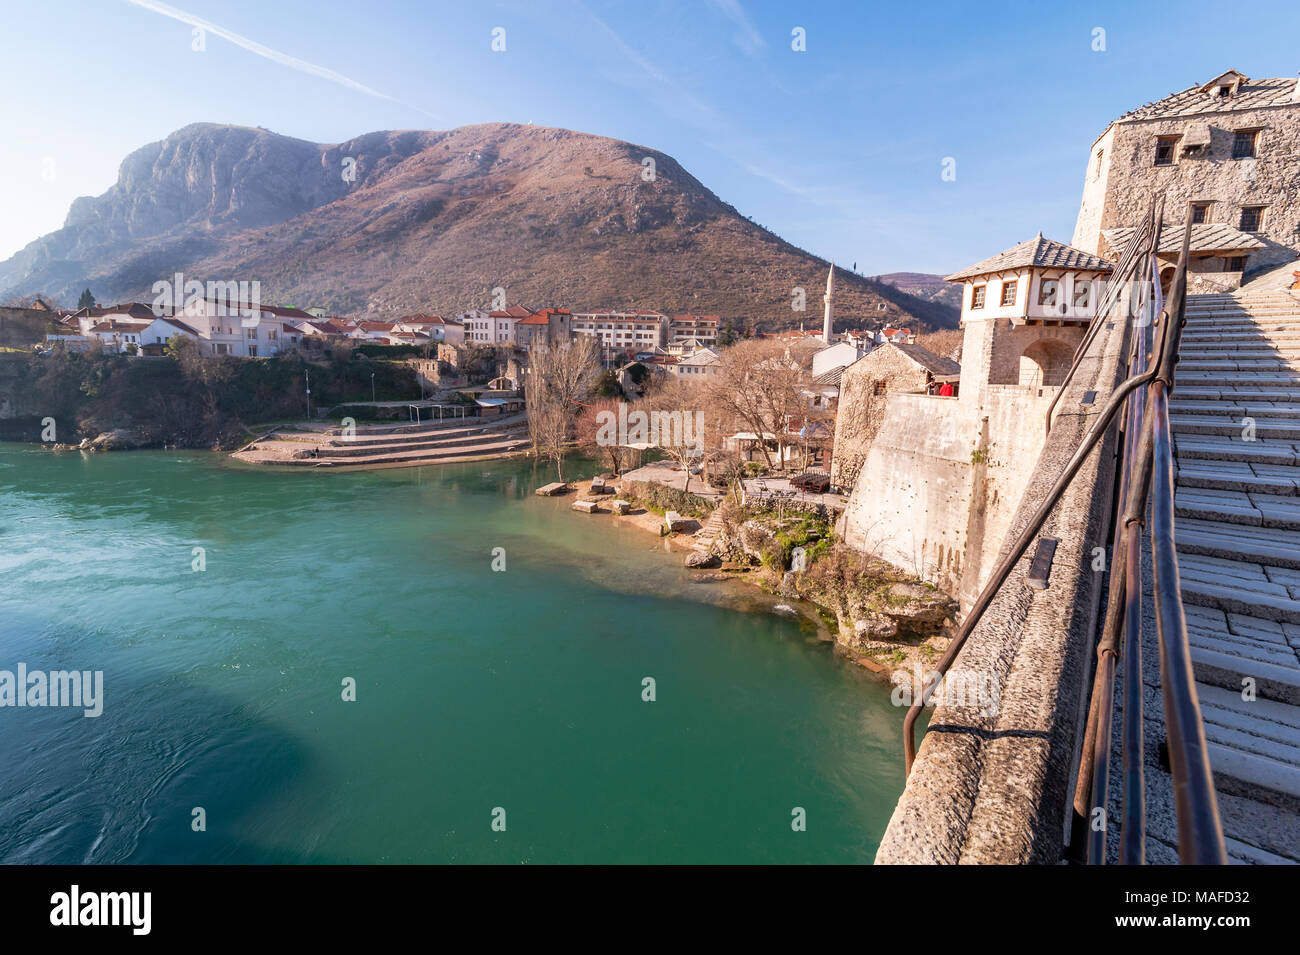 Stari Most (Old Bridge) landscape city of Mostar in Bosnia - Stock Image